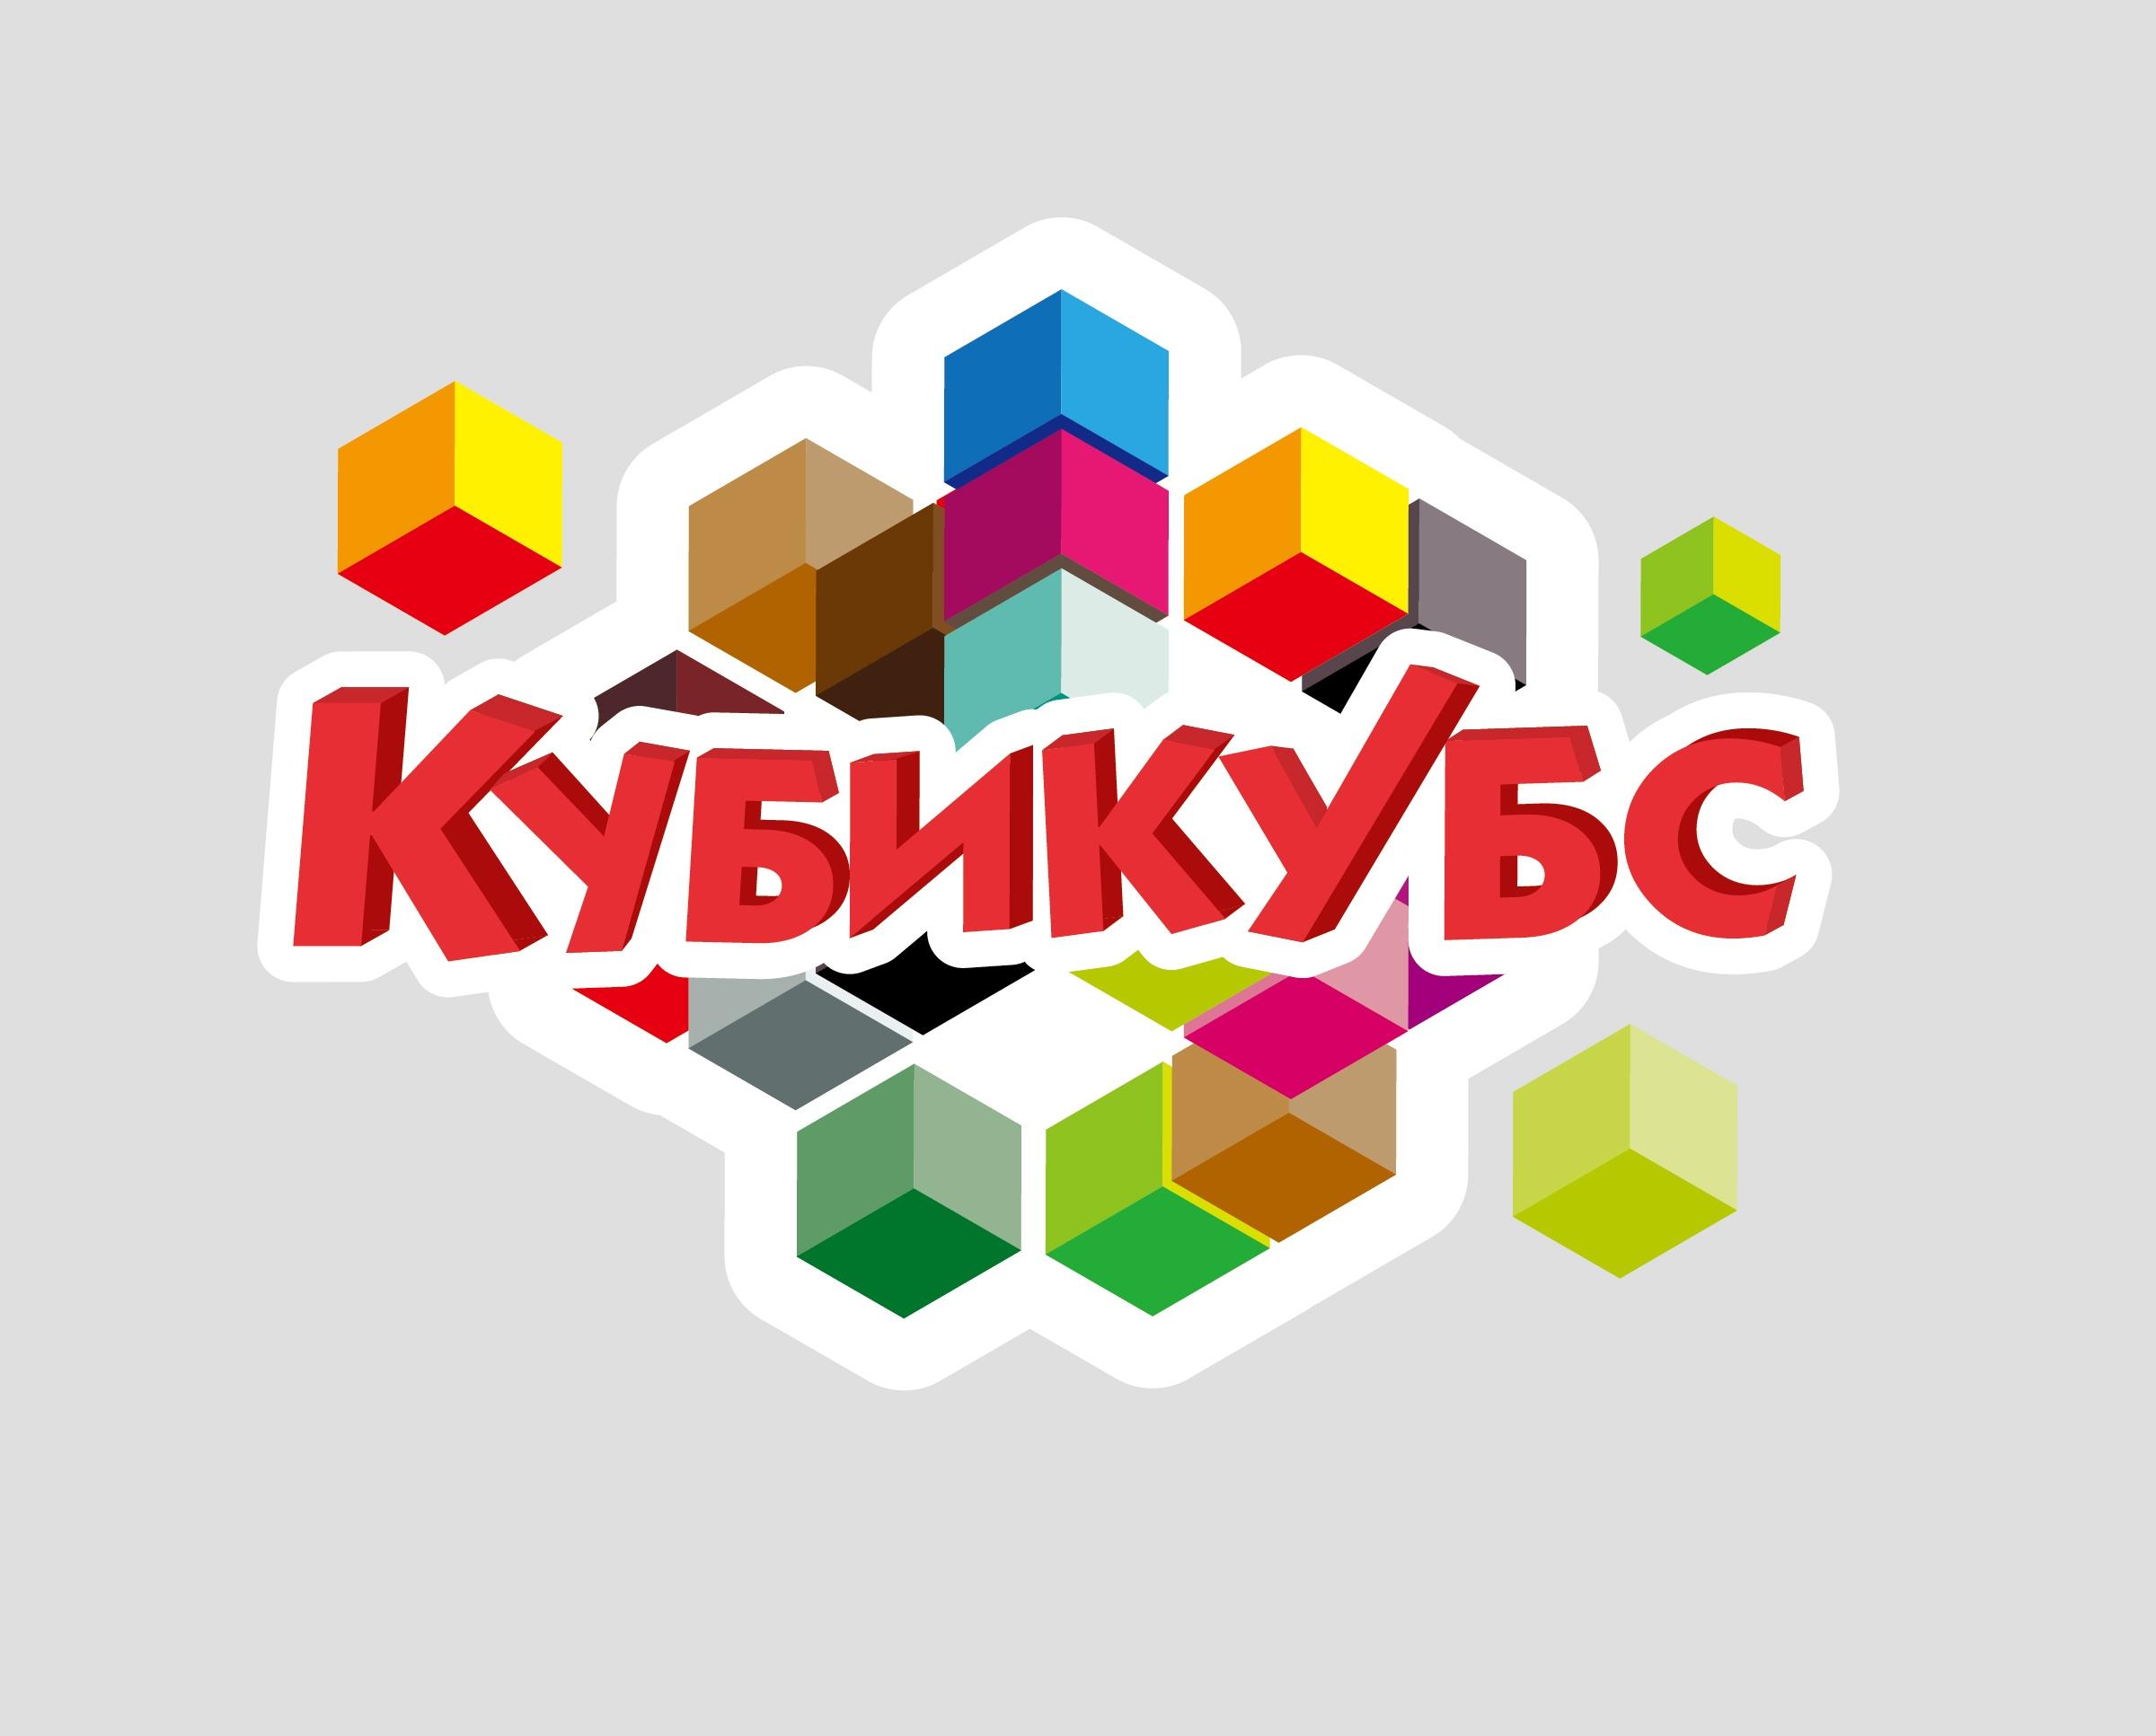 КубКубс